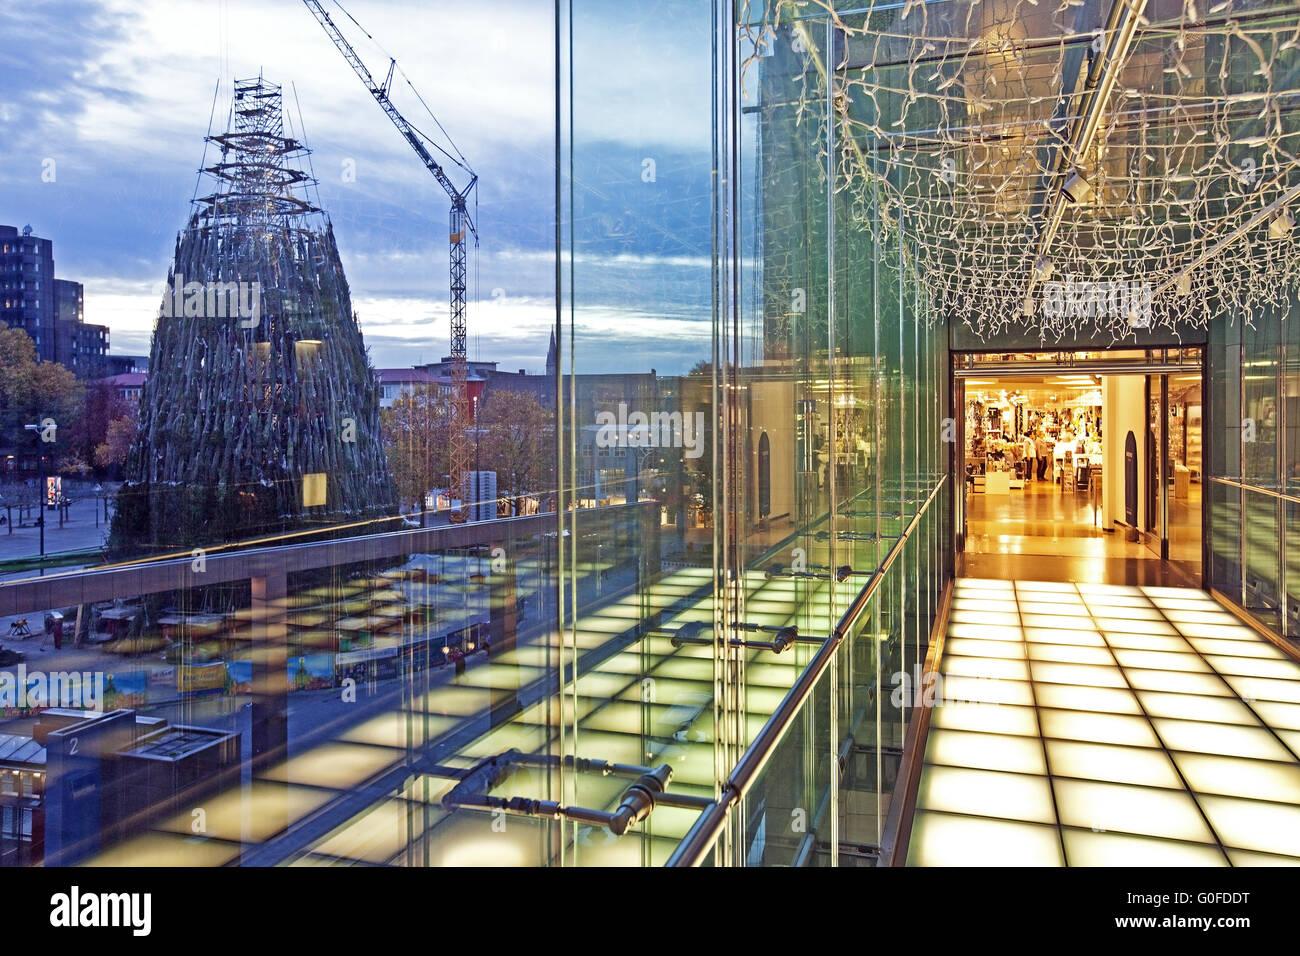 Christmas Department, Store building transition, Dortmund Stock Photo